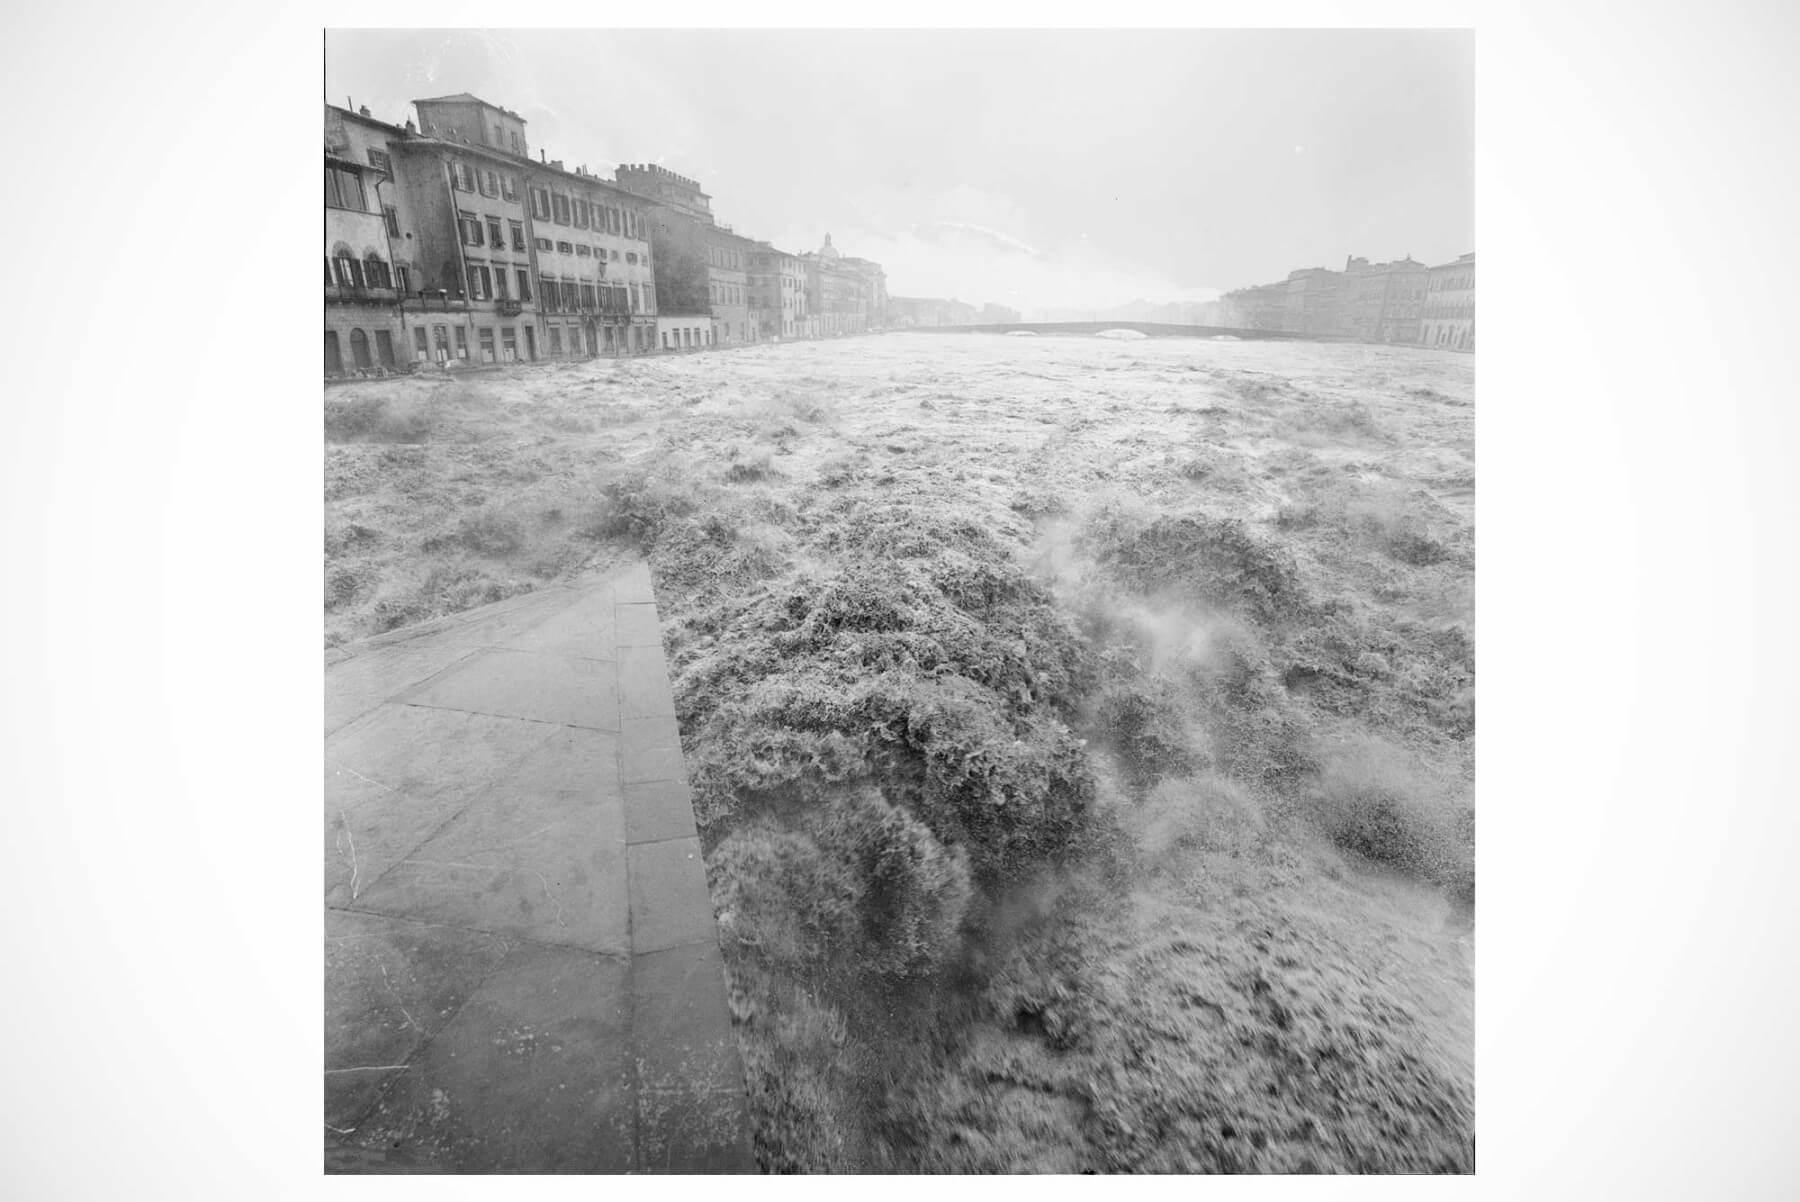 Balthazar Korab     L'Arno Straripa - vintage print from the Florence Flood collection